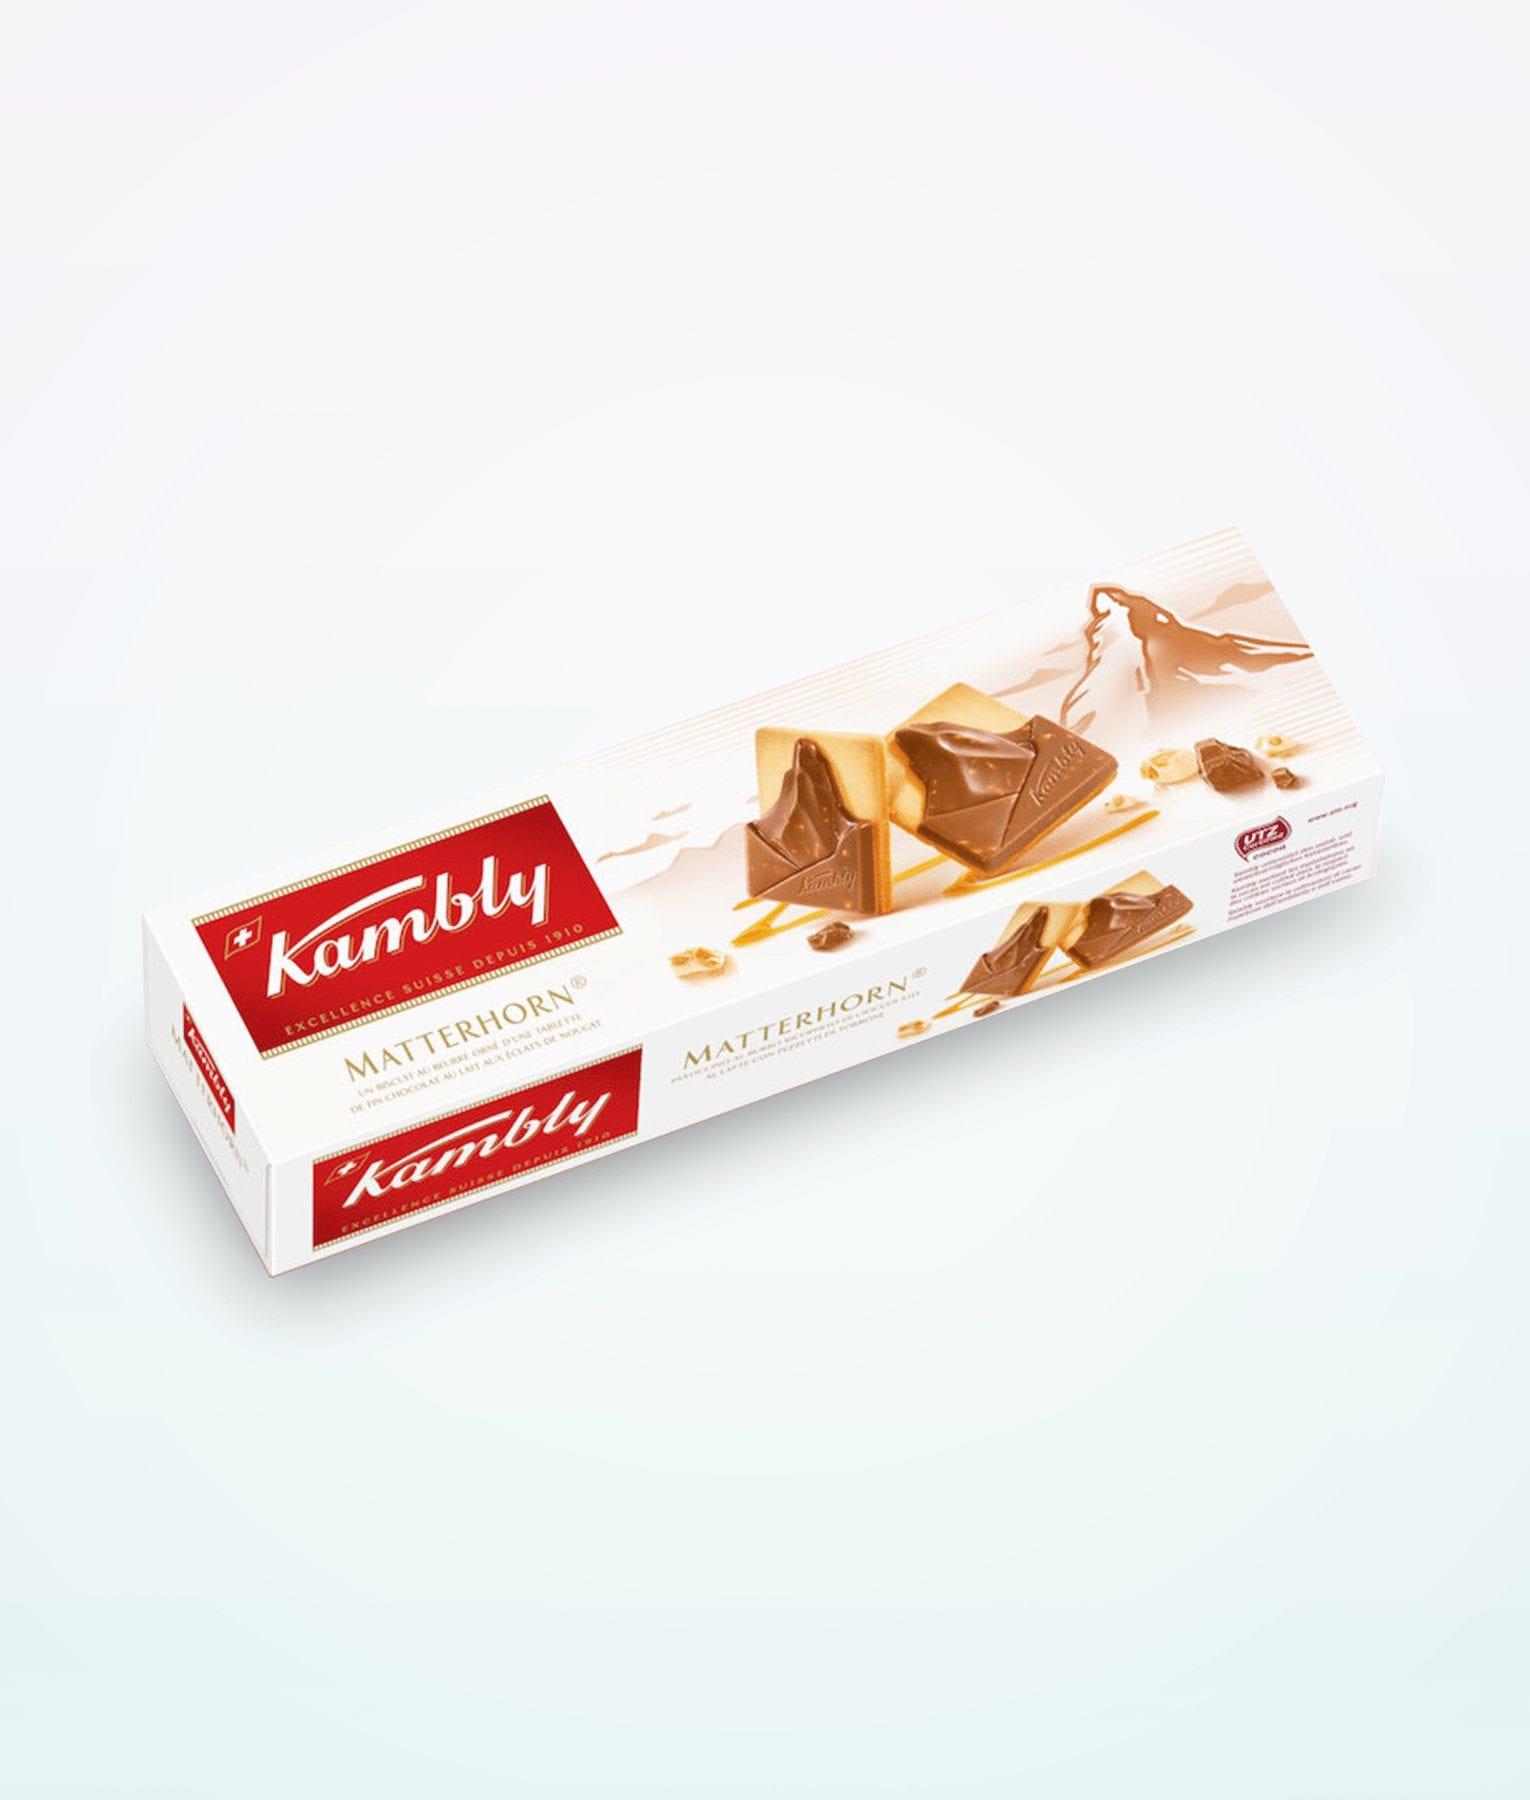 kambly-mattethorn-biscuit-100g